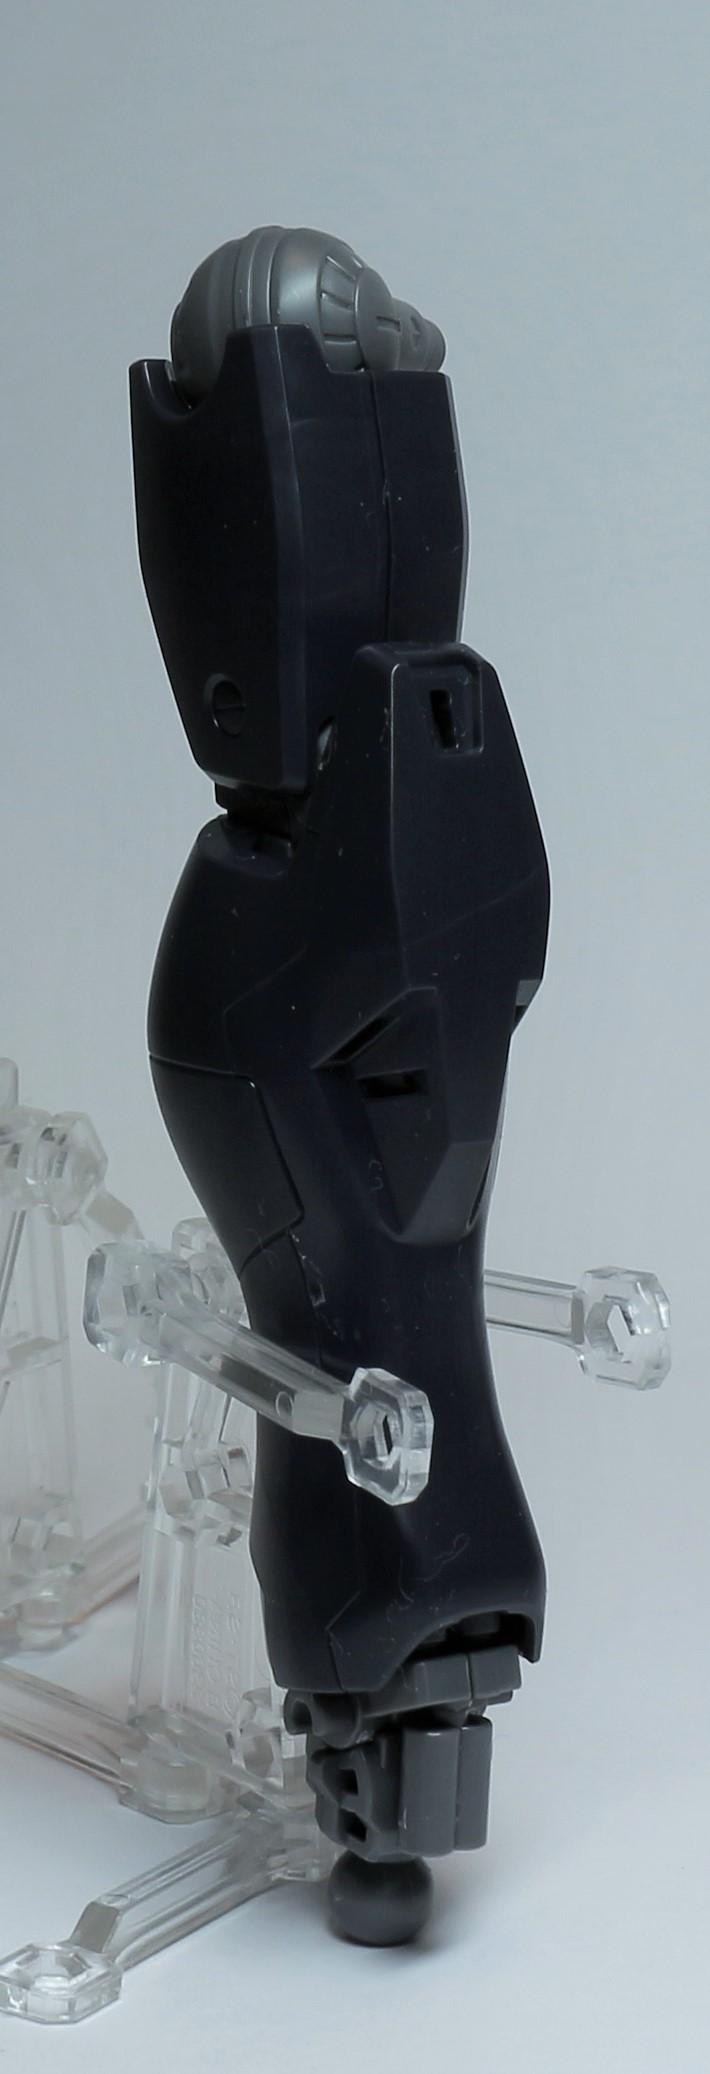 MG-CrossBone_X2_Custom-96.jpg